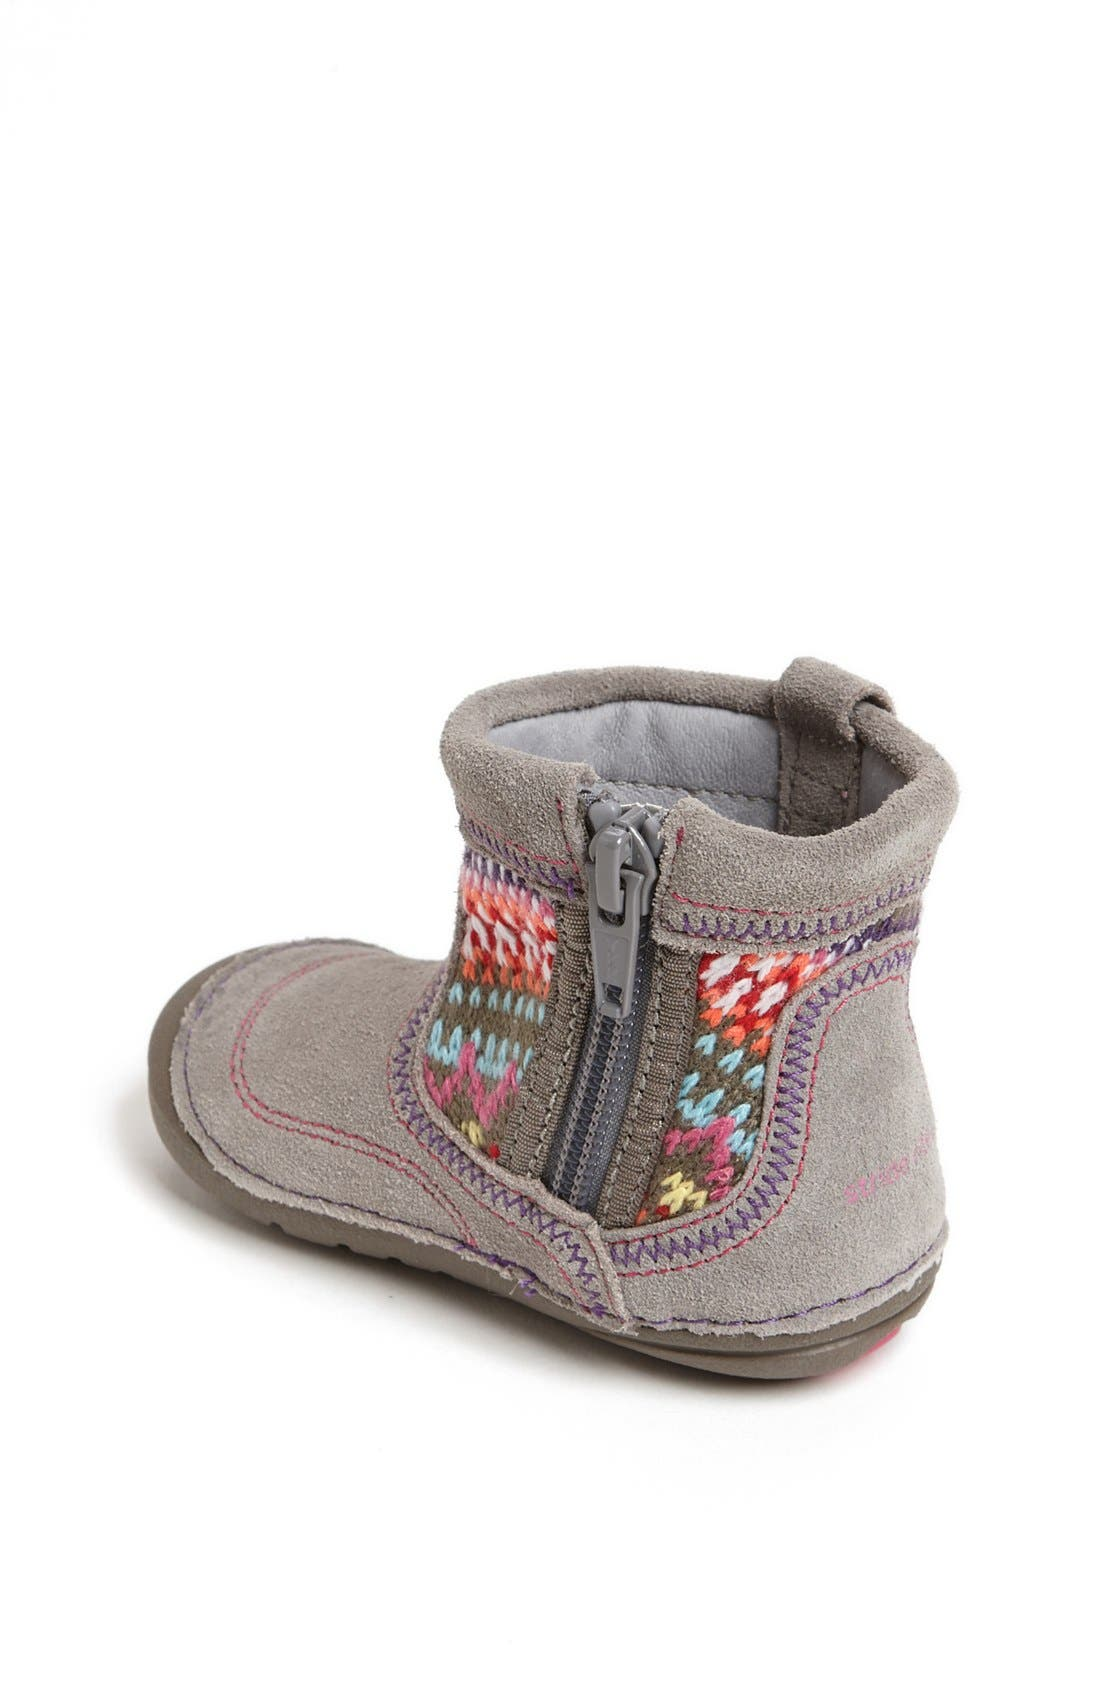 Alternate Image 2  - Stride Rite 'SRT Ainsley' Boot (Baby & Walker)